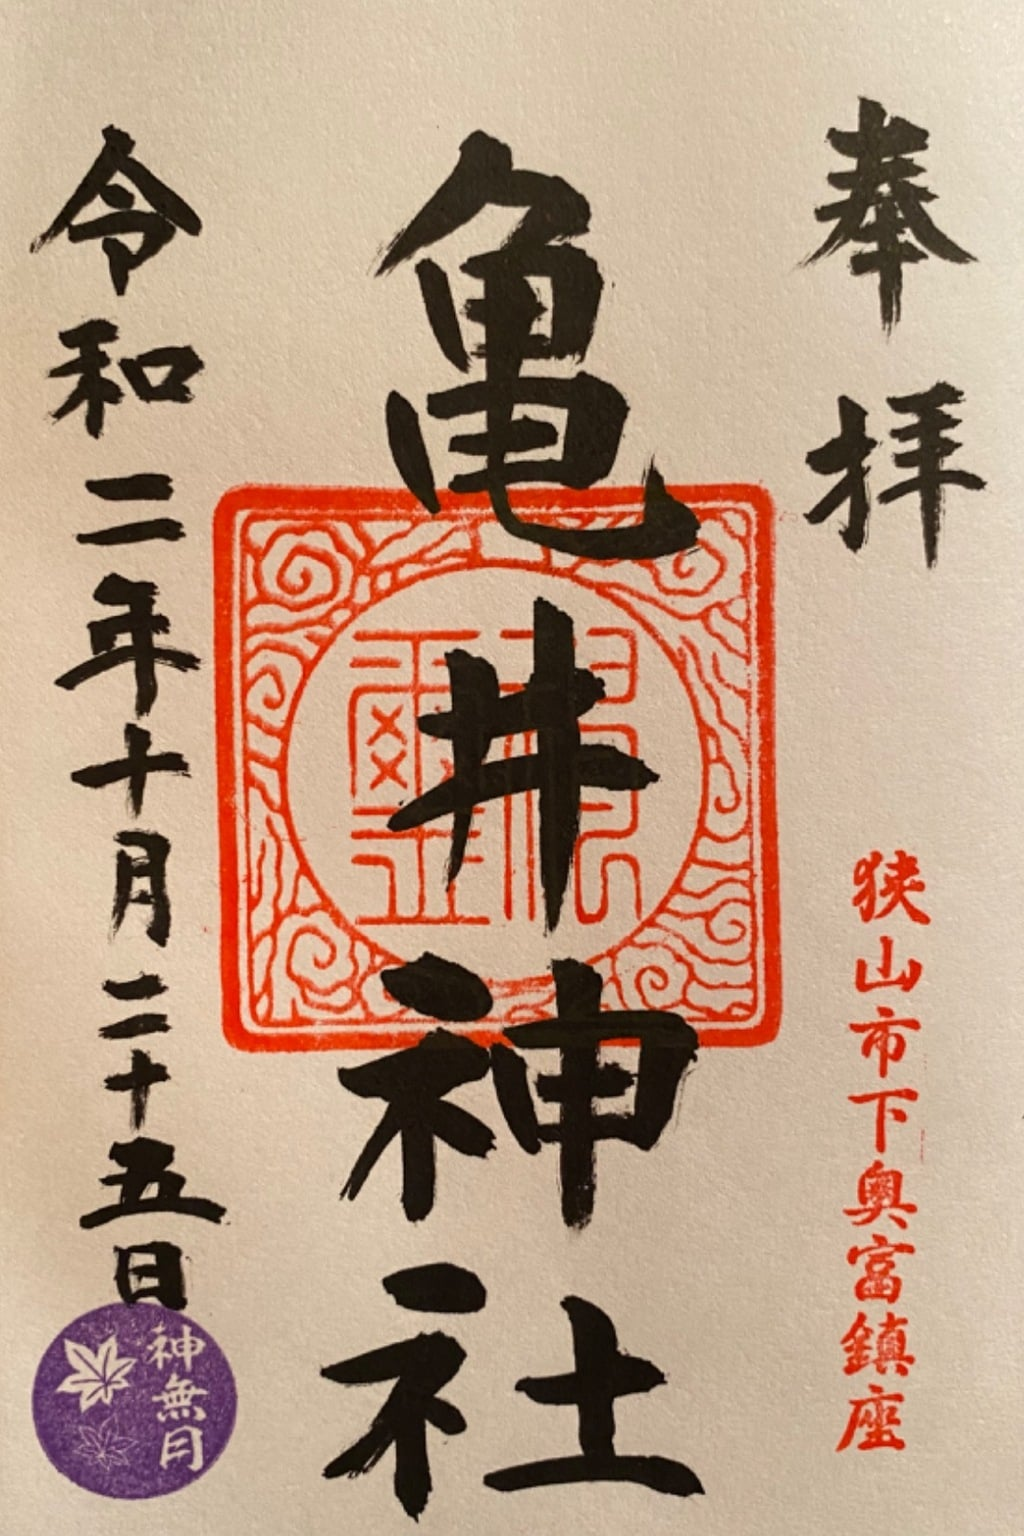 亀井神社の御朱印